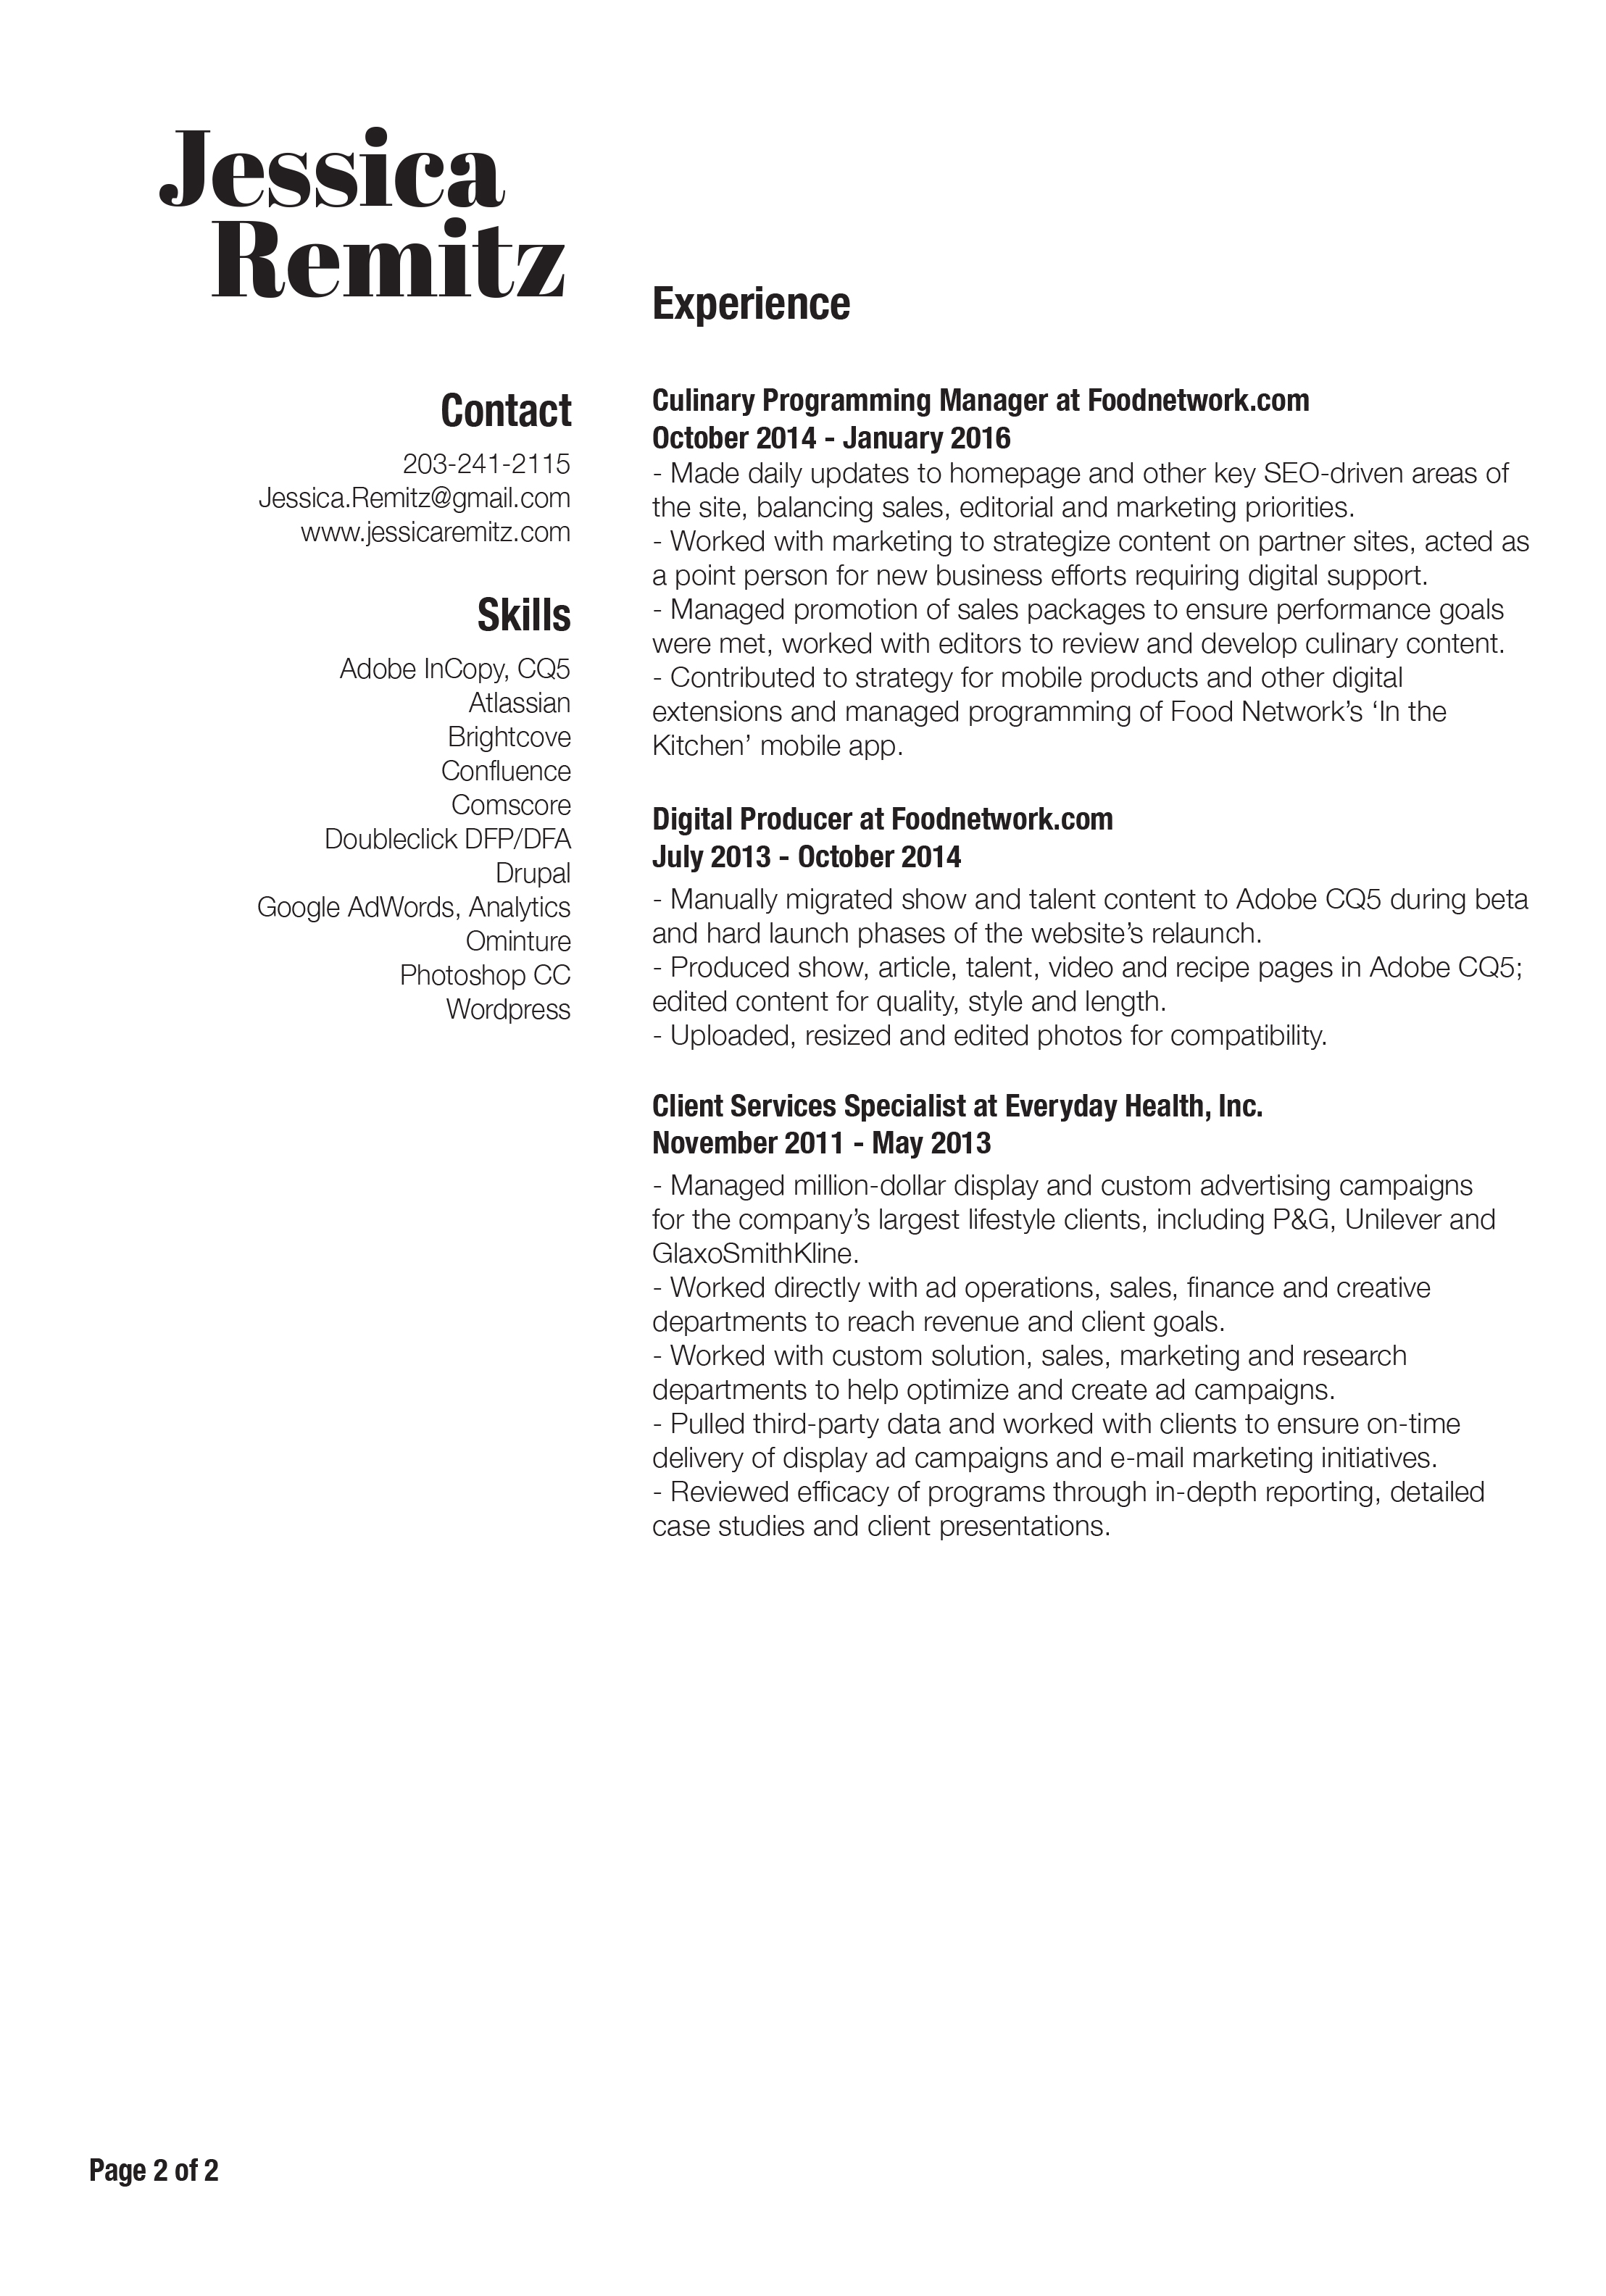 Jessica Remitz 2018 Resume-2.jpg